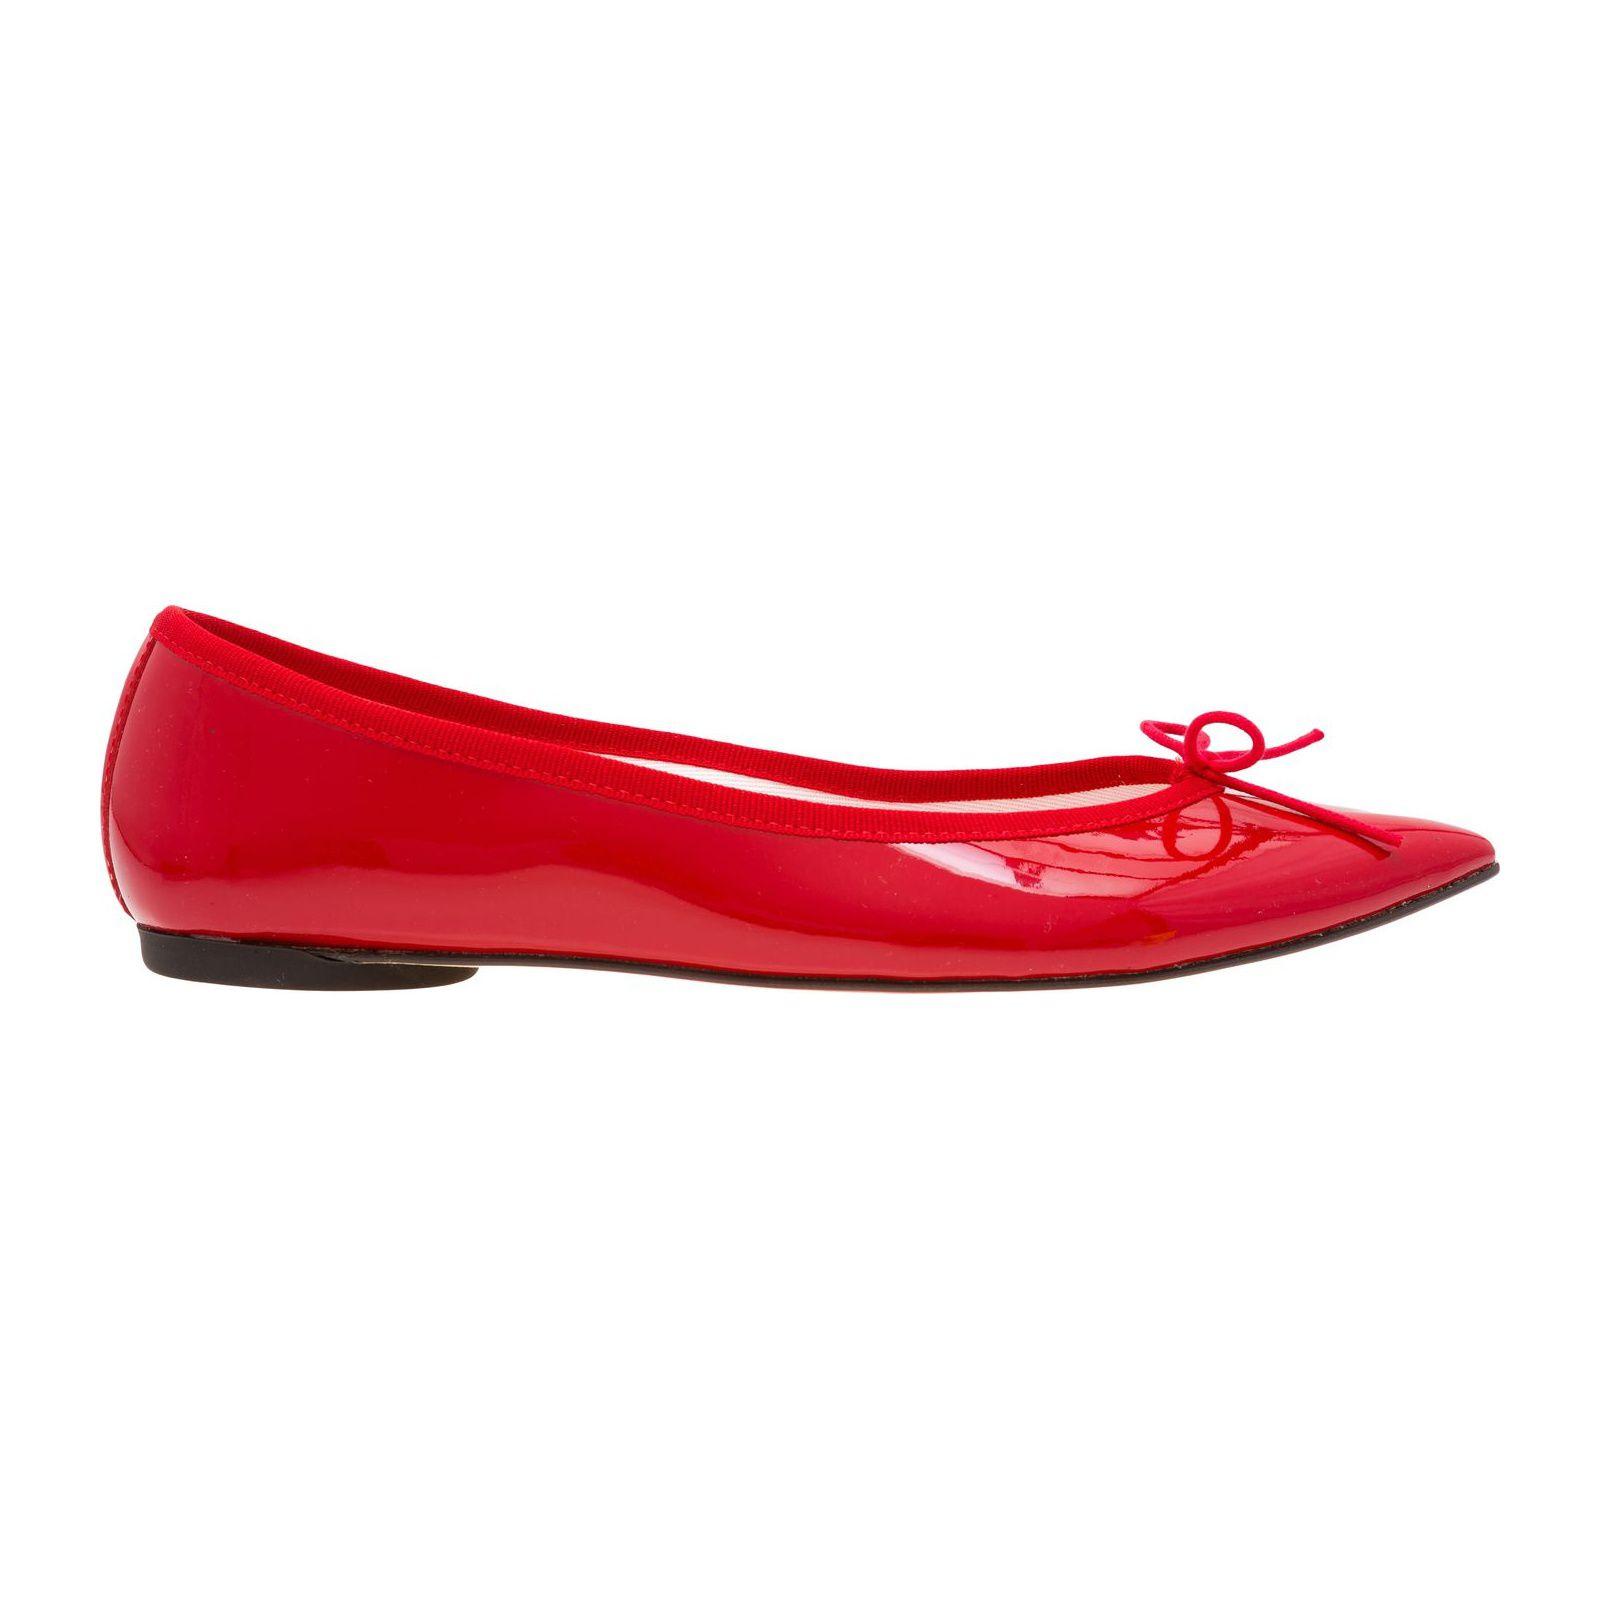 Sapatilha Brigitte Verniz - Vermelha